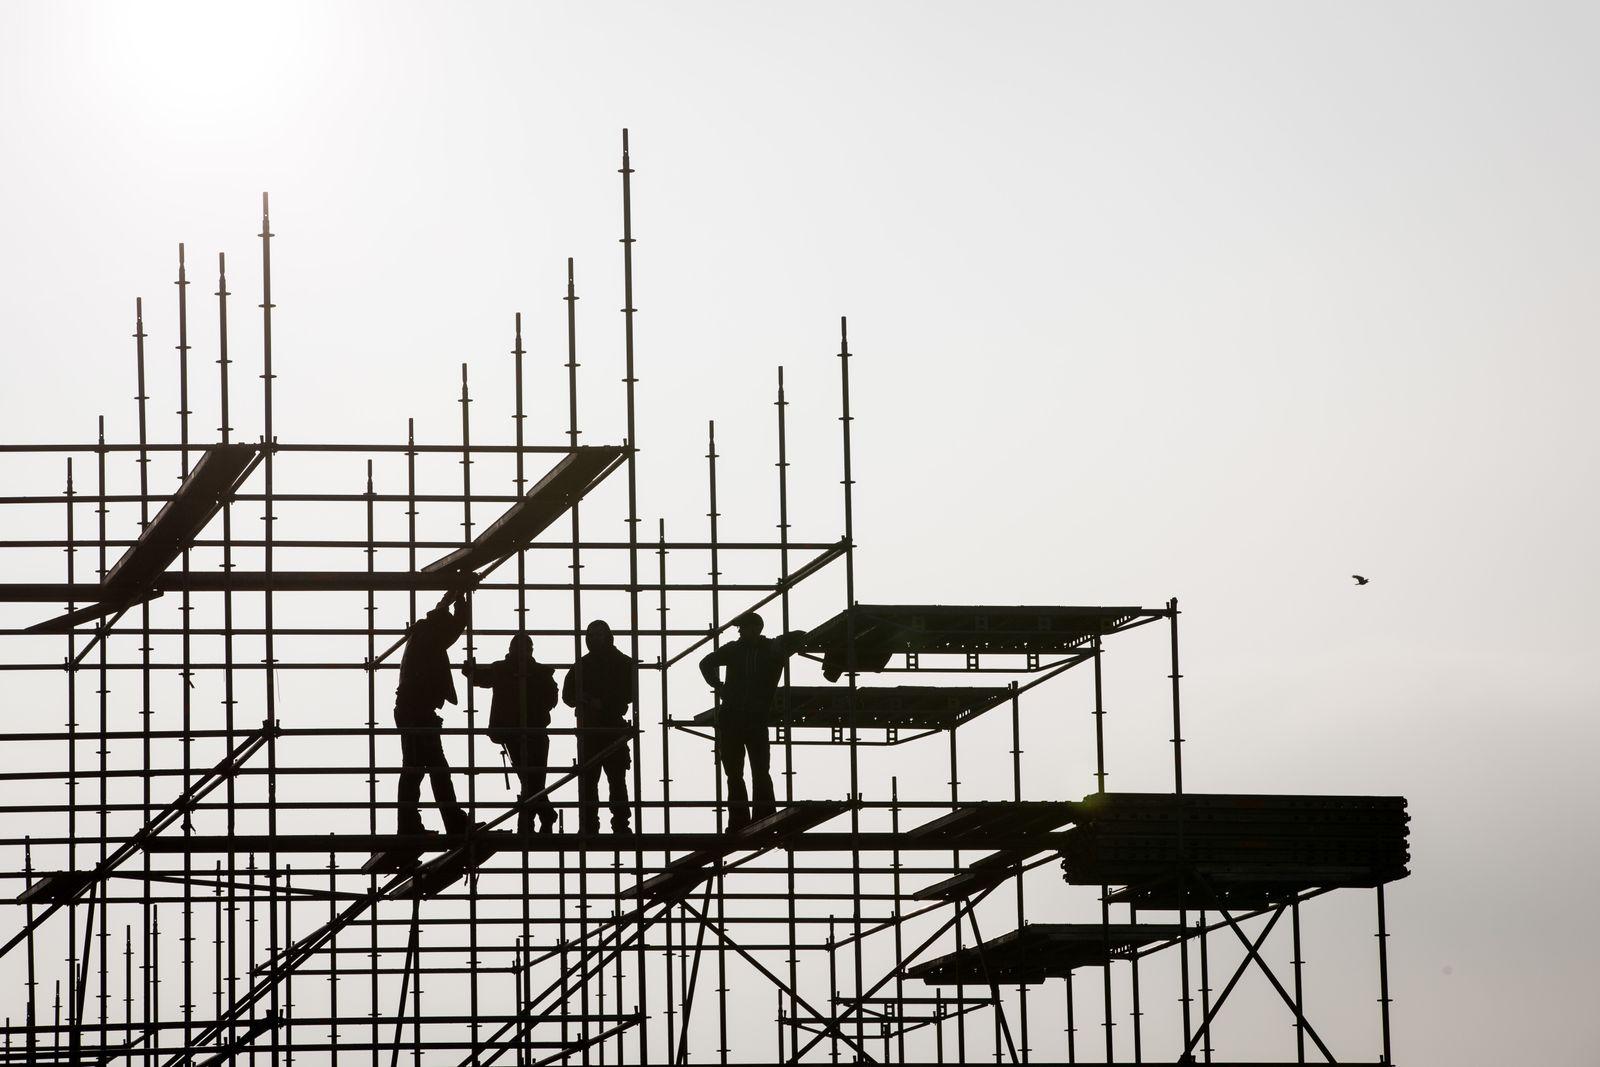 Niedriglohn/ Bauarbeiter